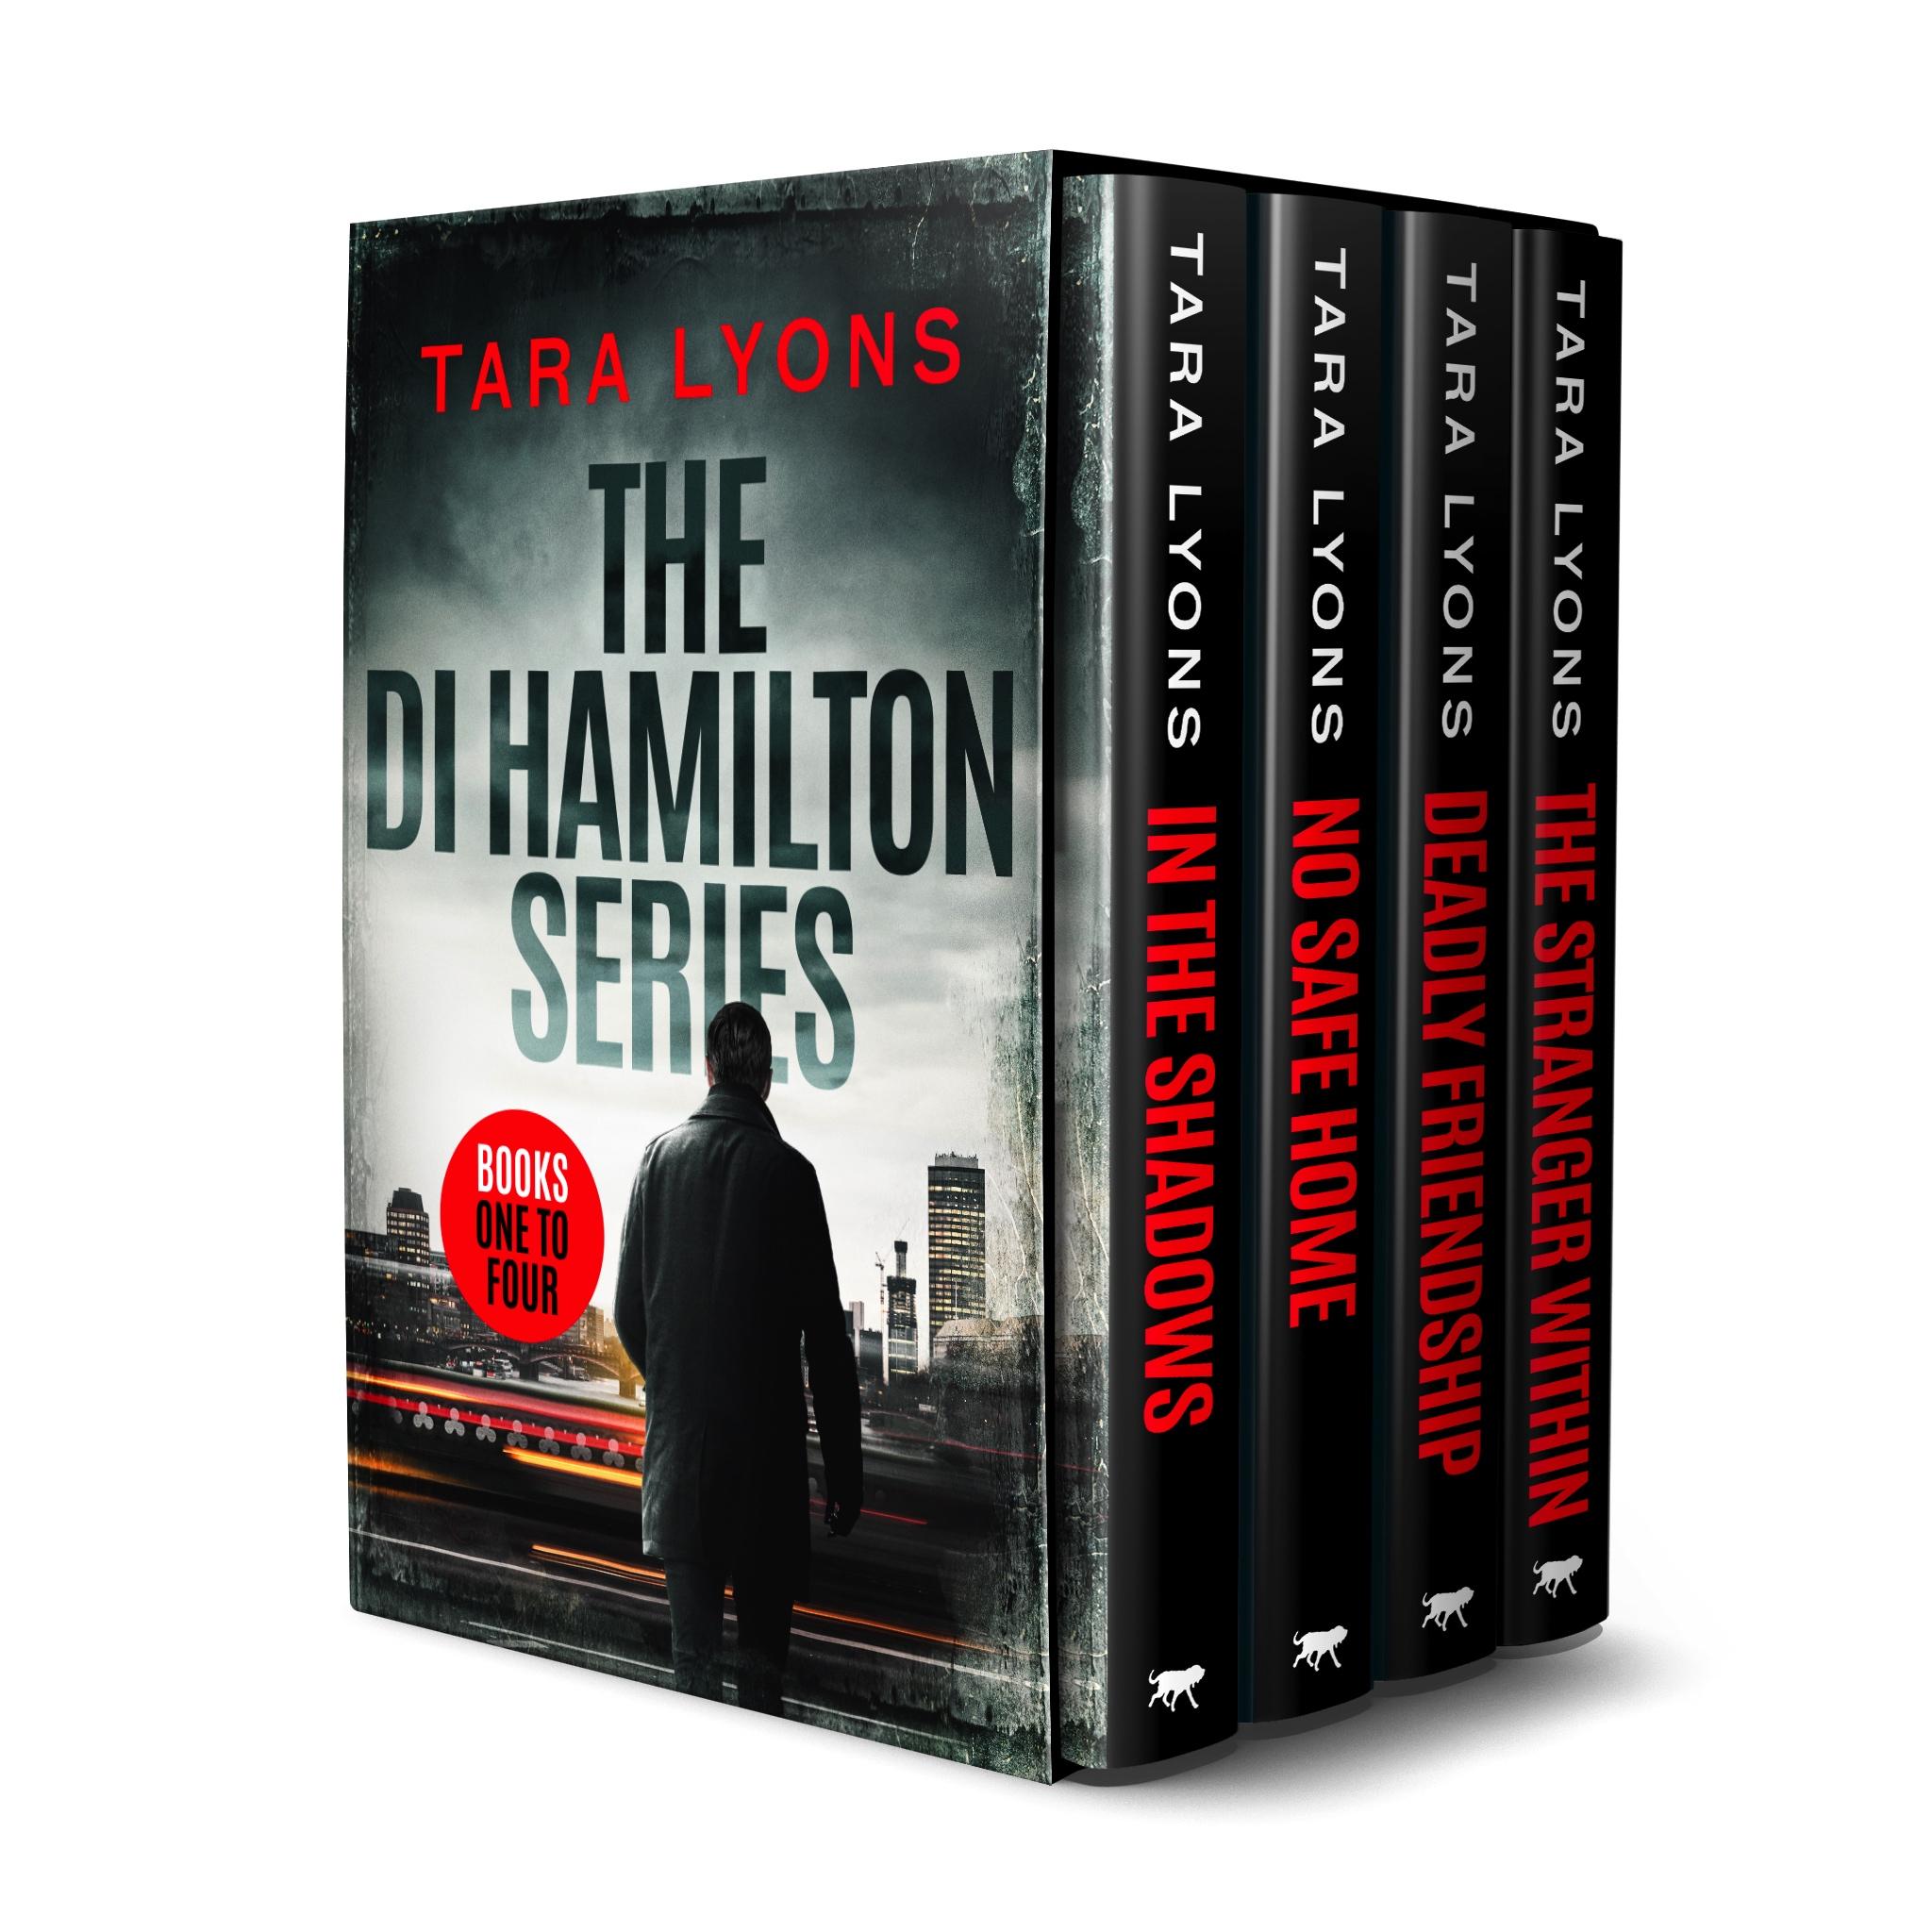 The-DI-Hamilton-Series-Kindle.jpg